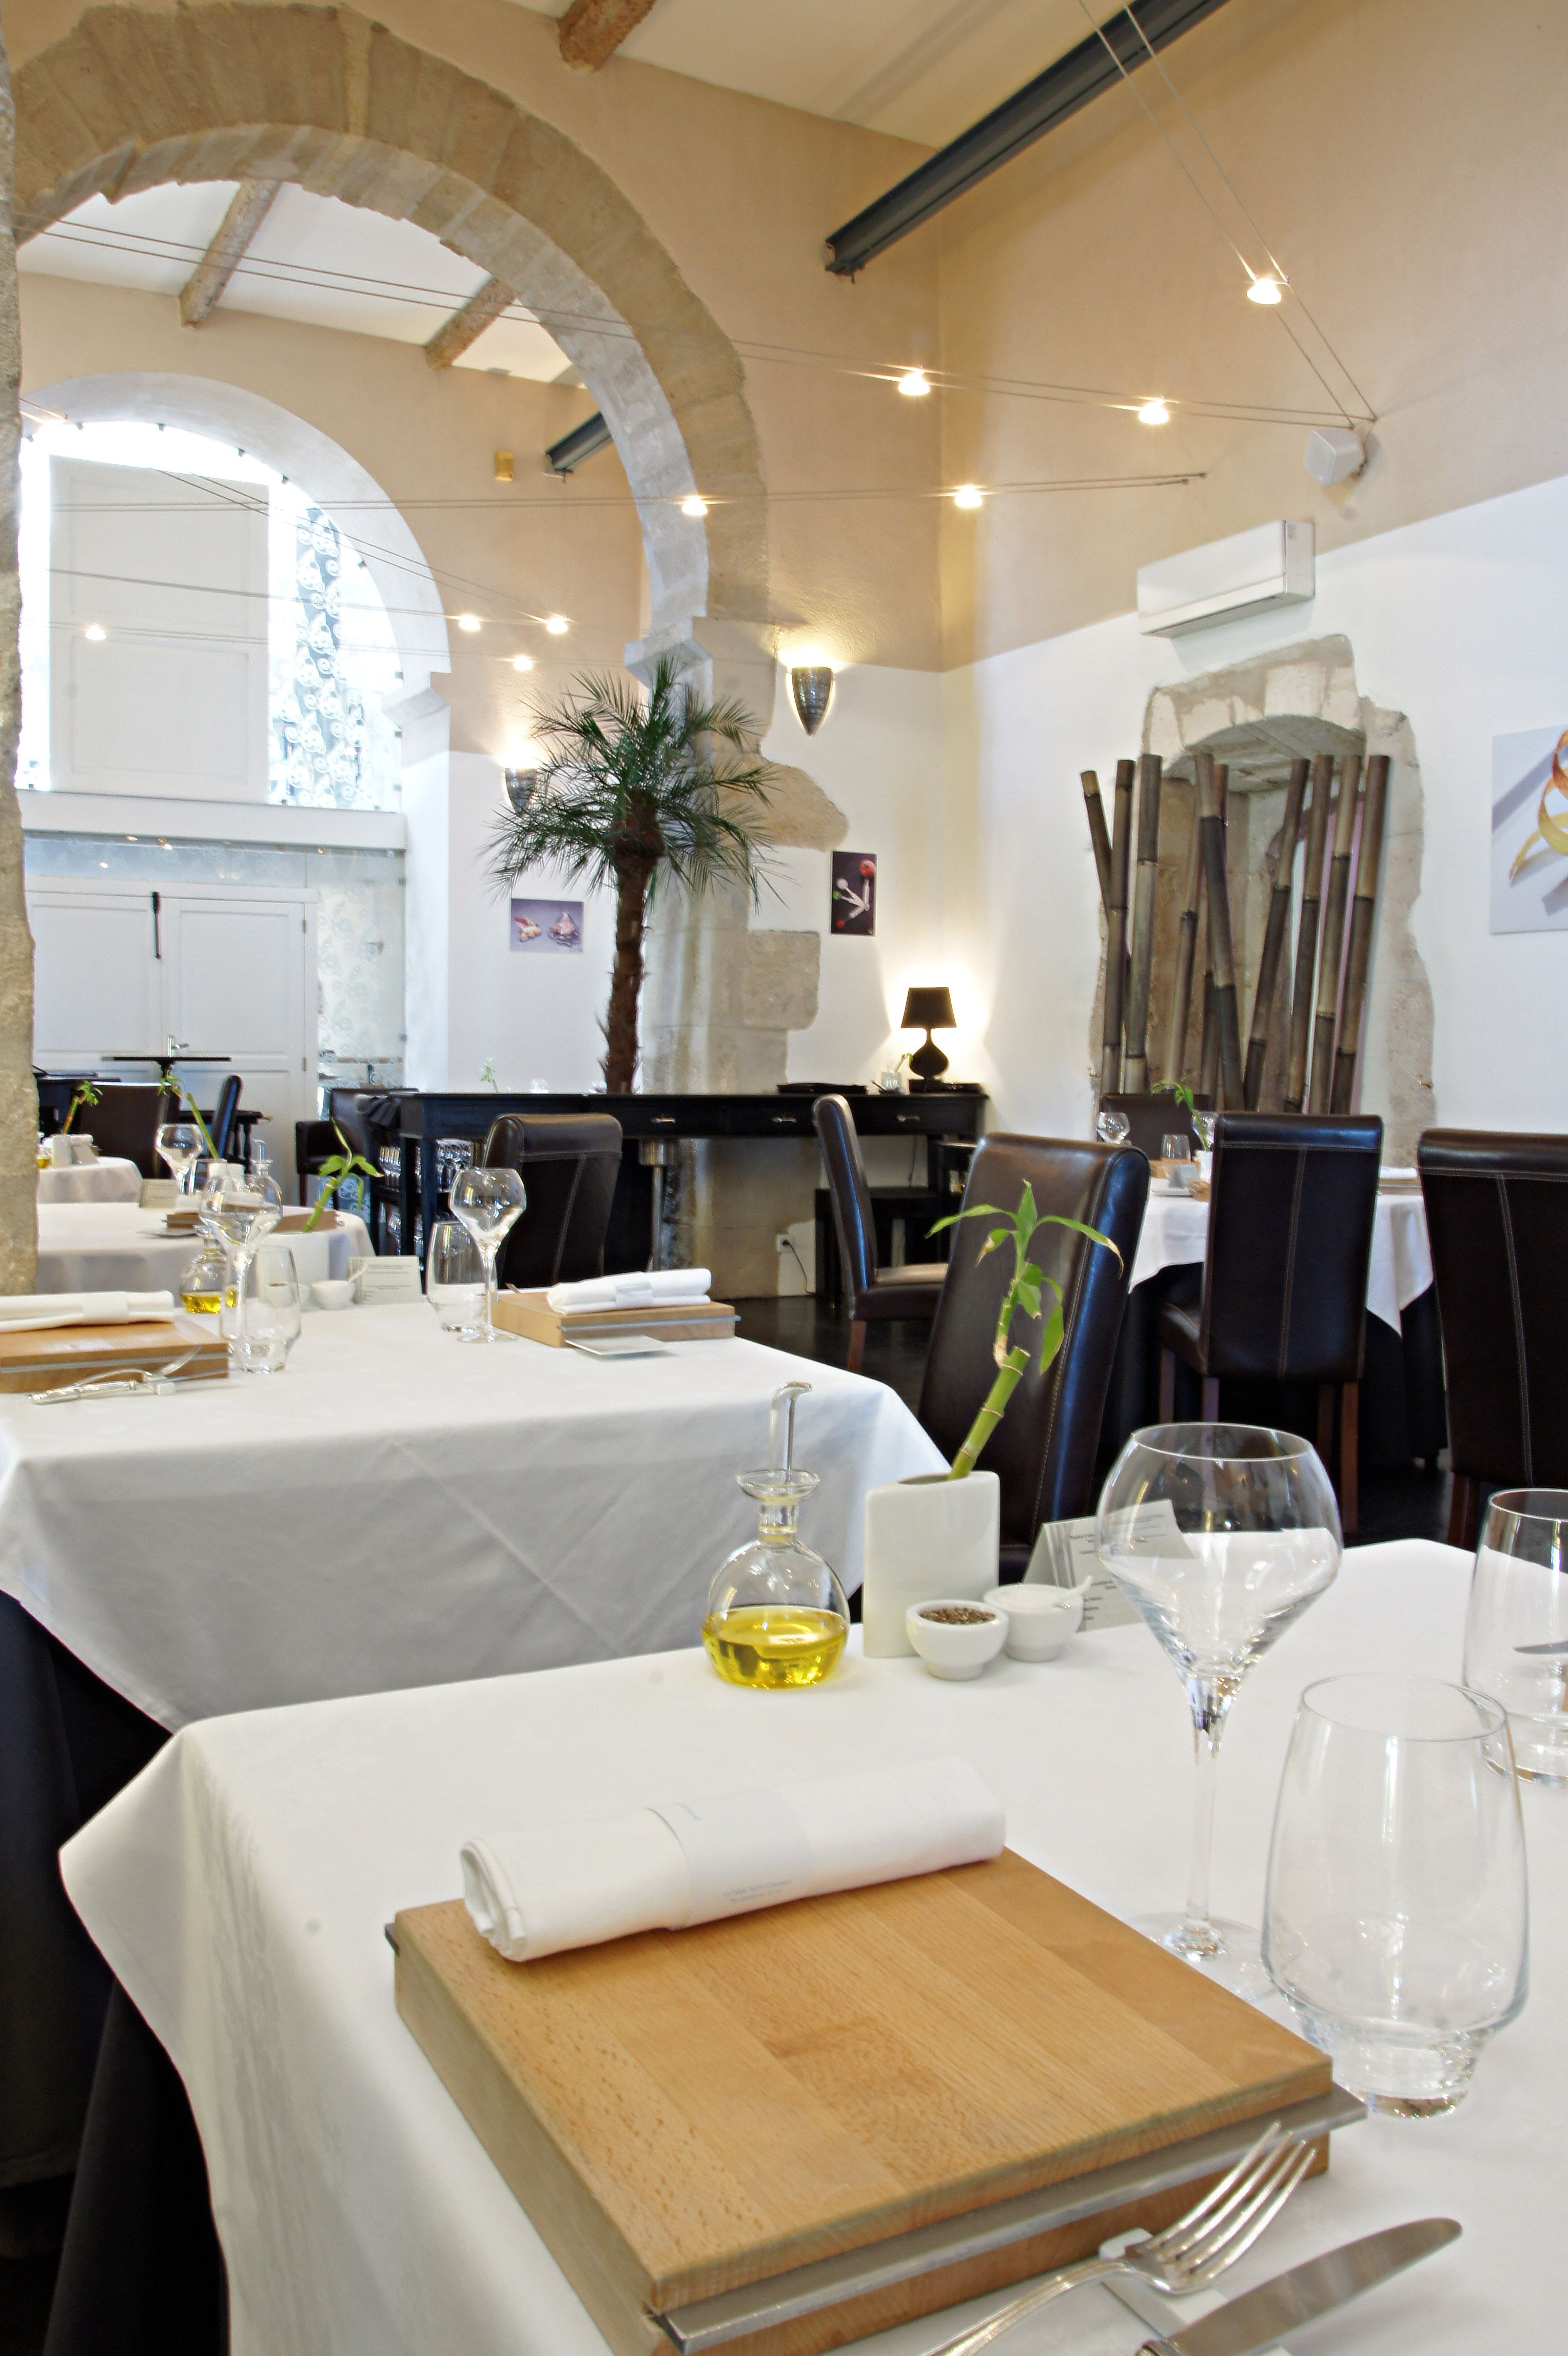 Restaurant Table Restaurant Tables Table Interior Design